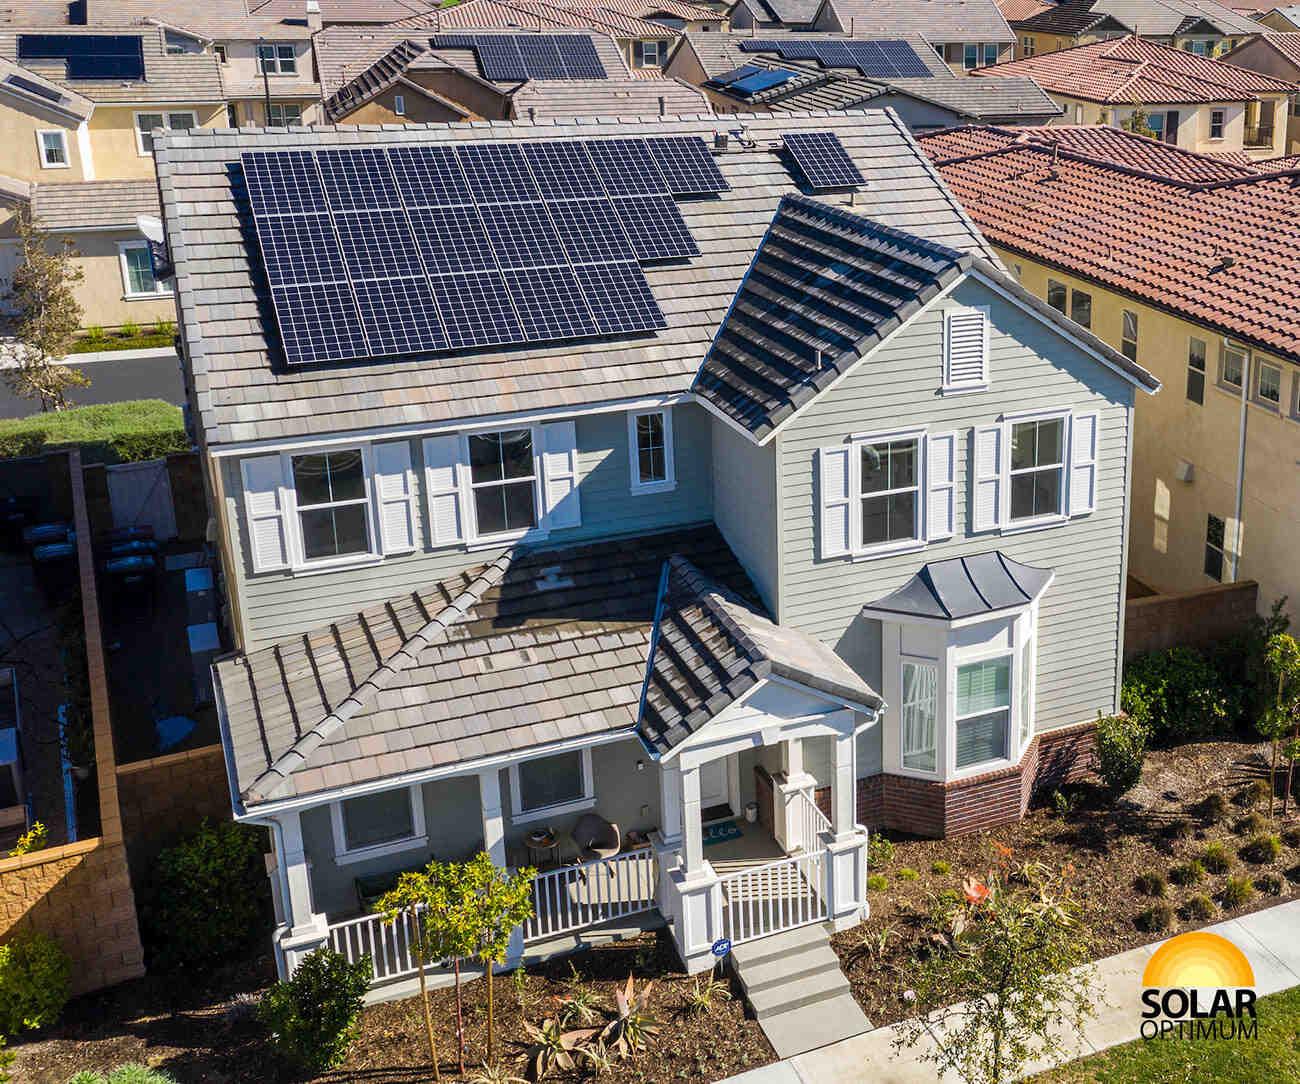 How do I choose a solar company?